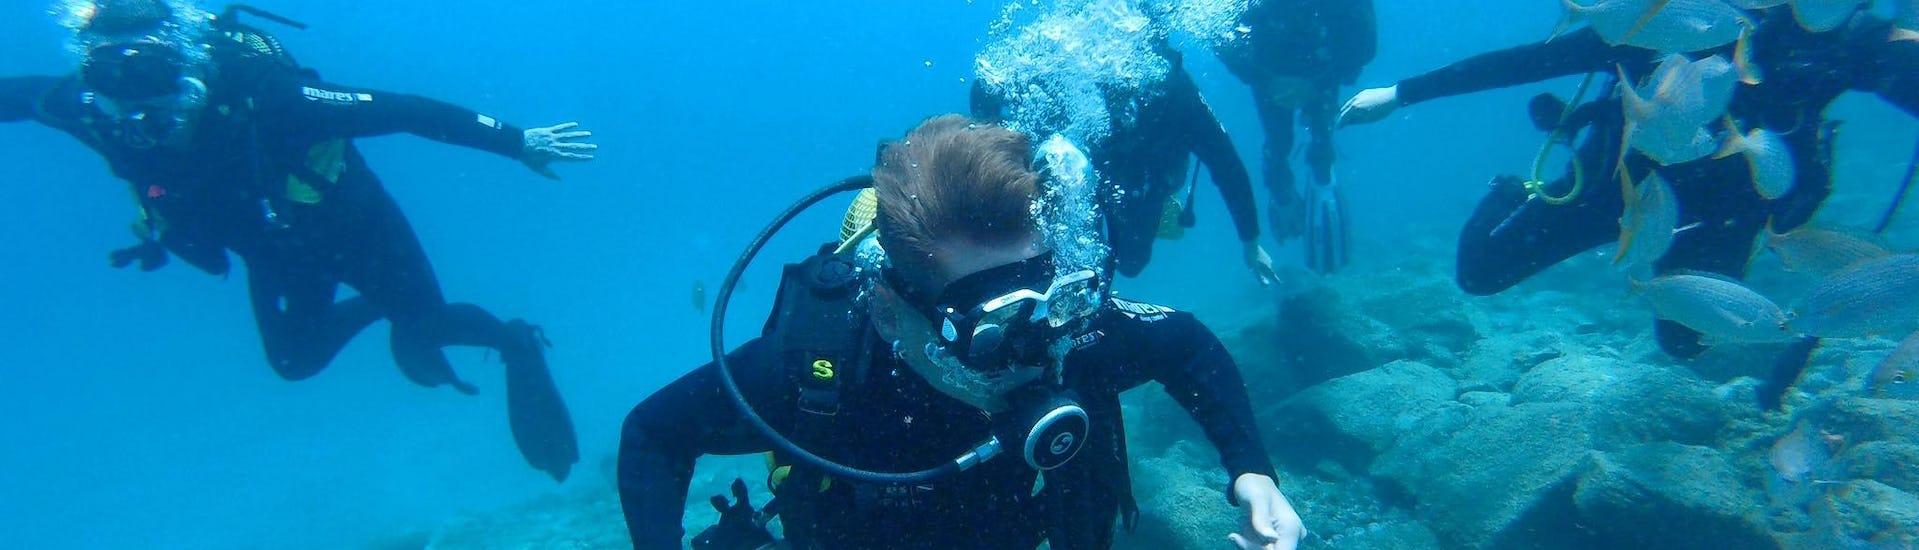 Trial Scuba Diving for Beginners - Las Vistas Beach